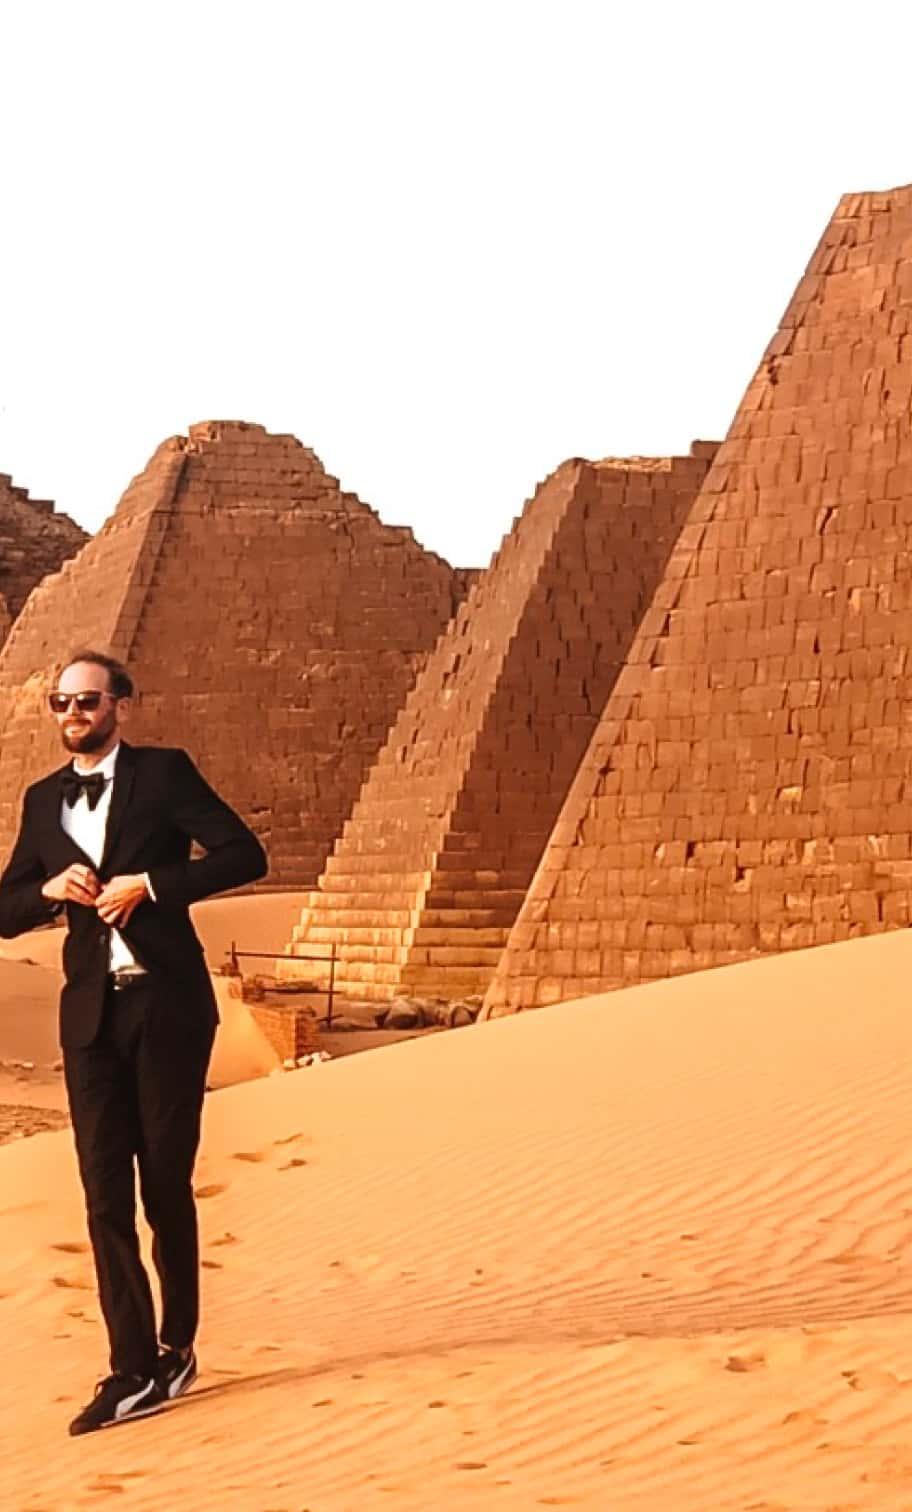 Garrett Gravesen poses in front of the pyramids in Egypt.